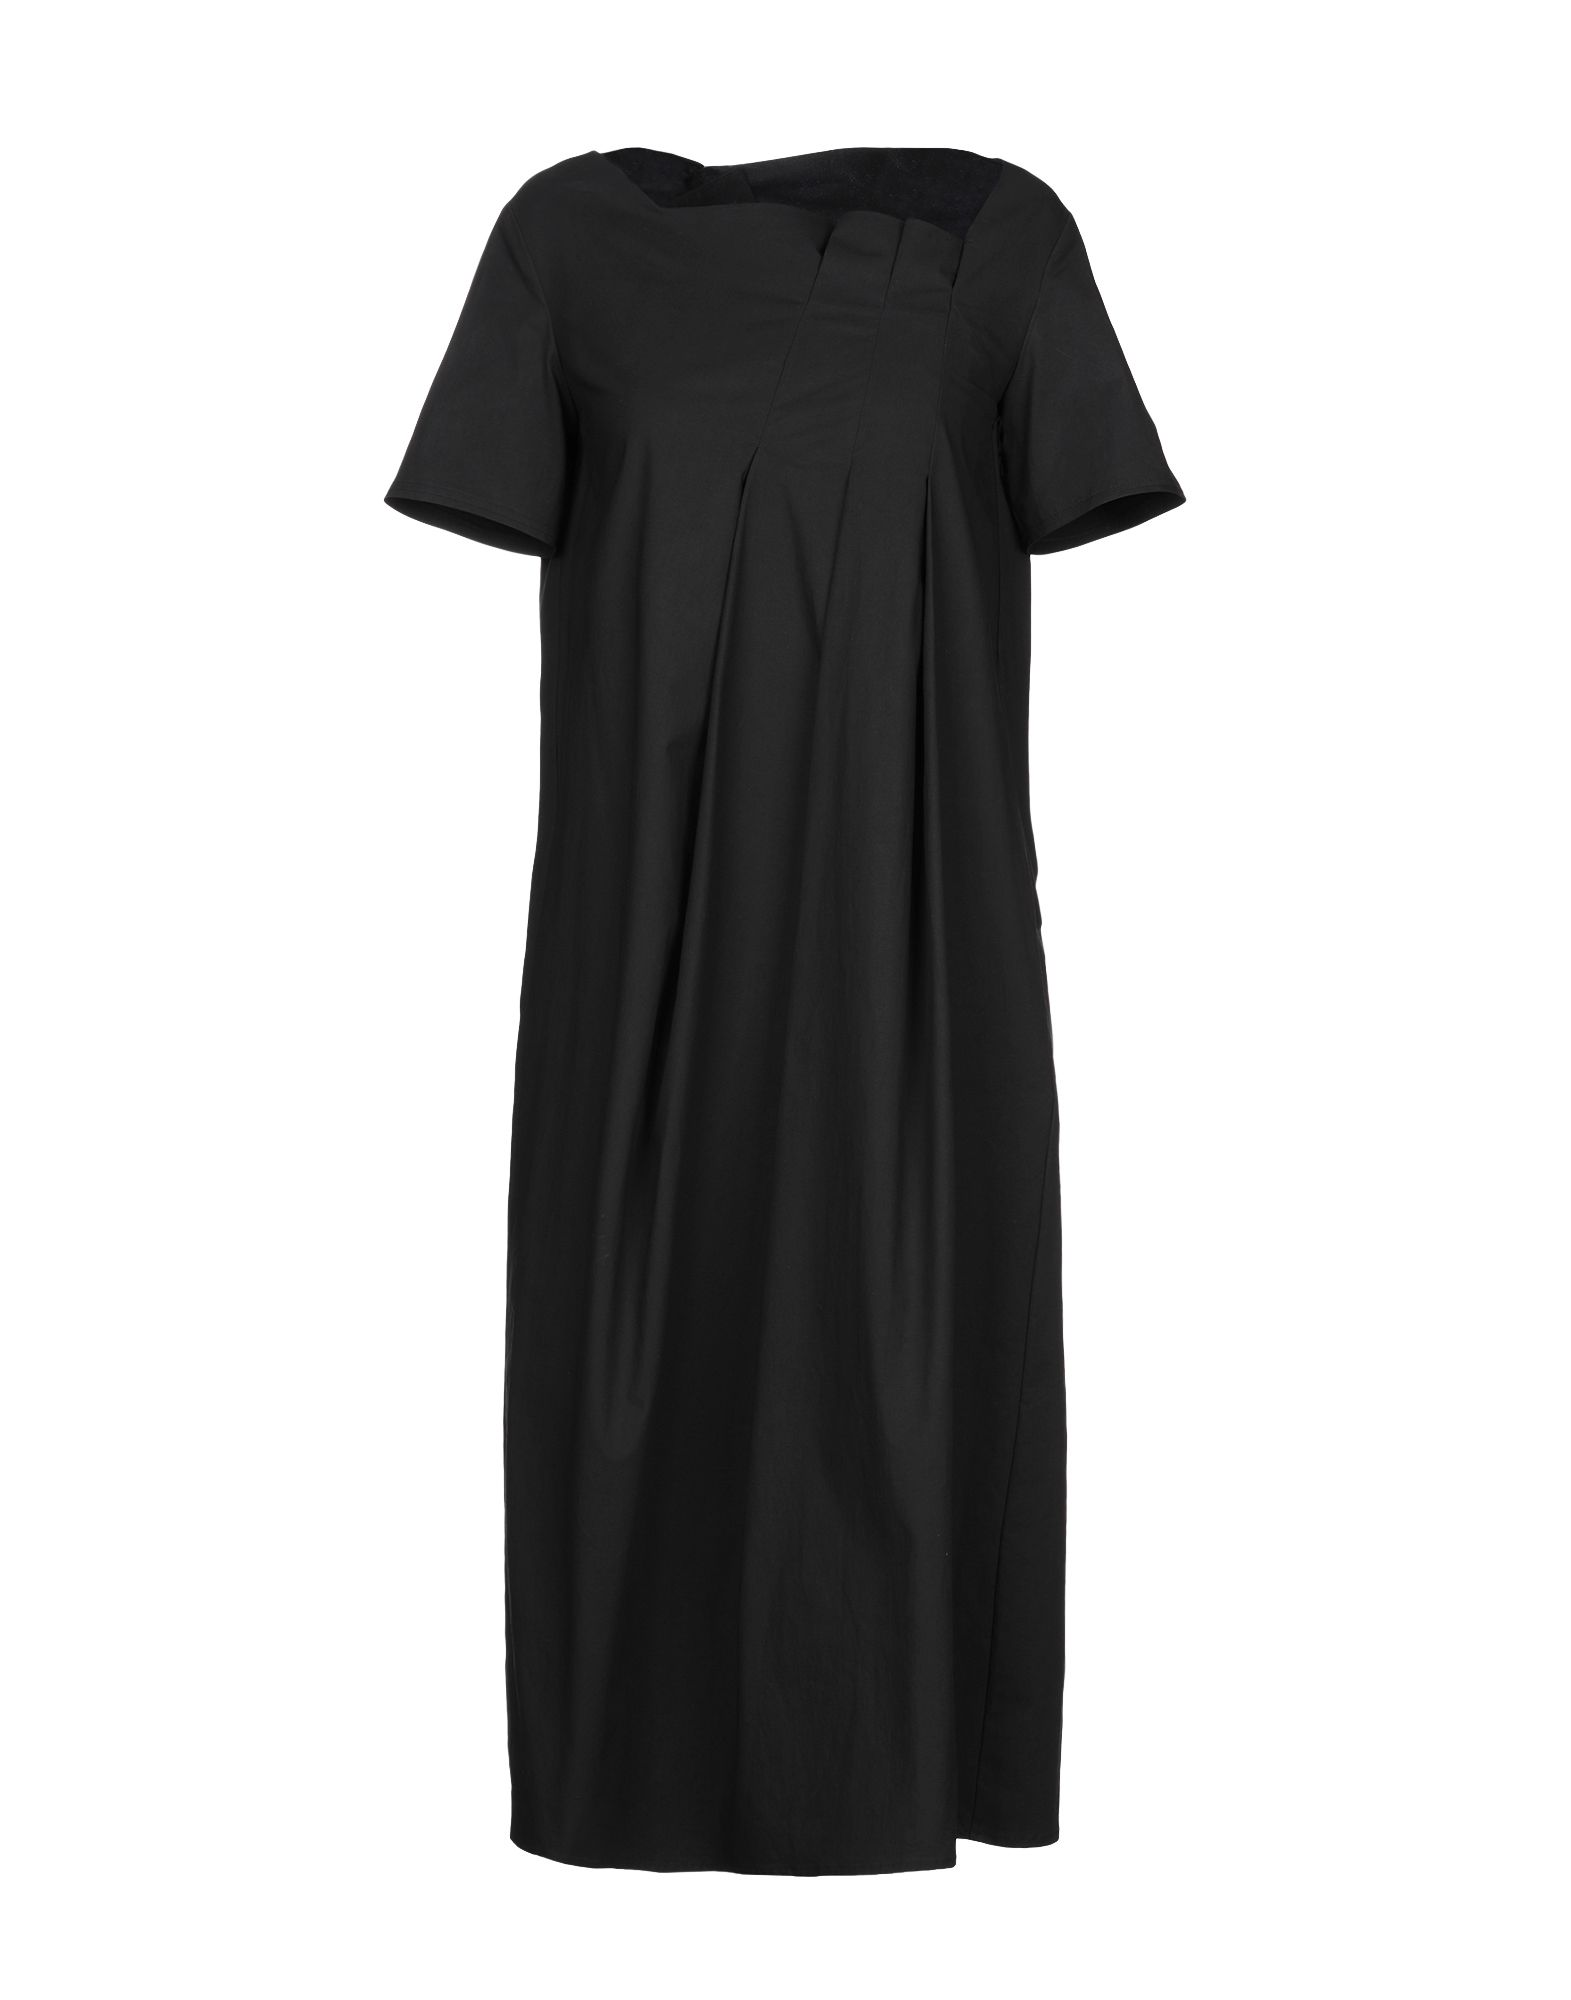 SONIA SPECIALE Платье длиной 3/4 sonia speciale платье до колена